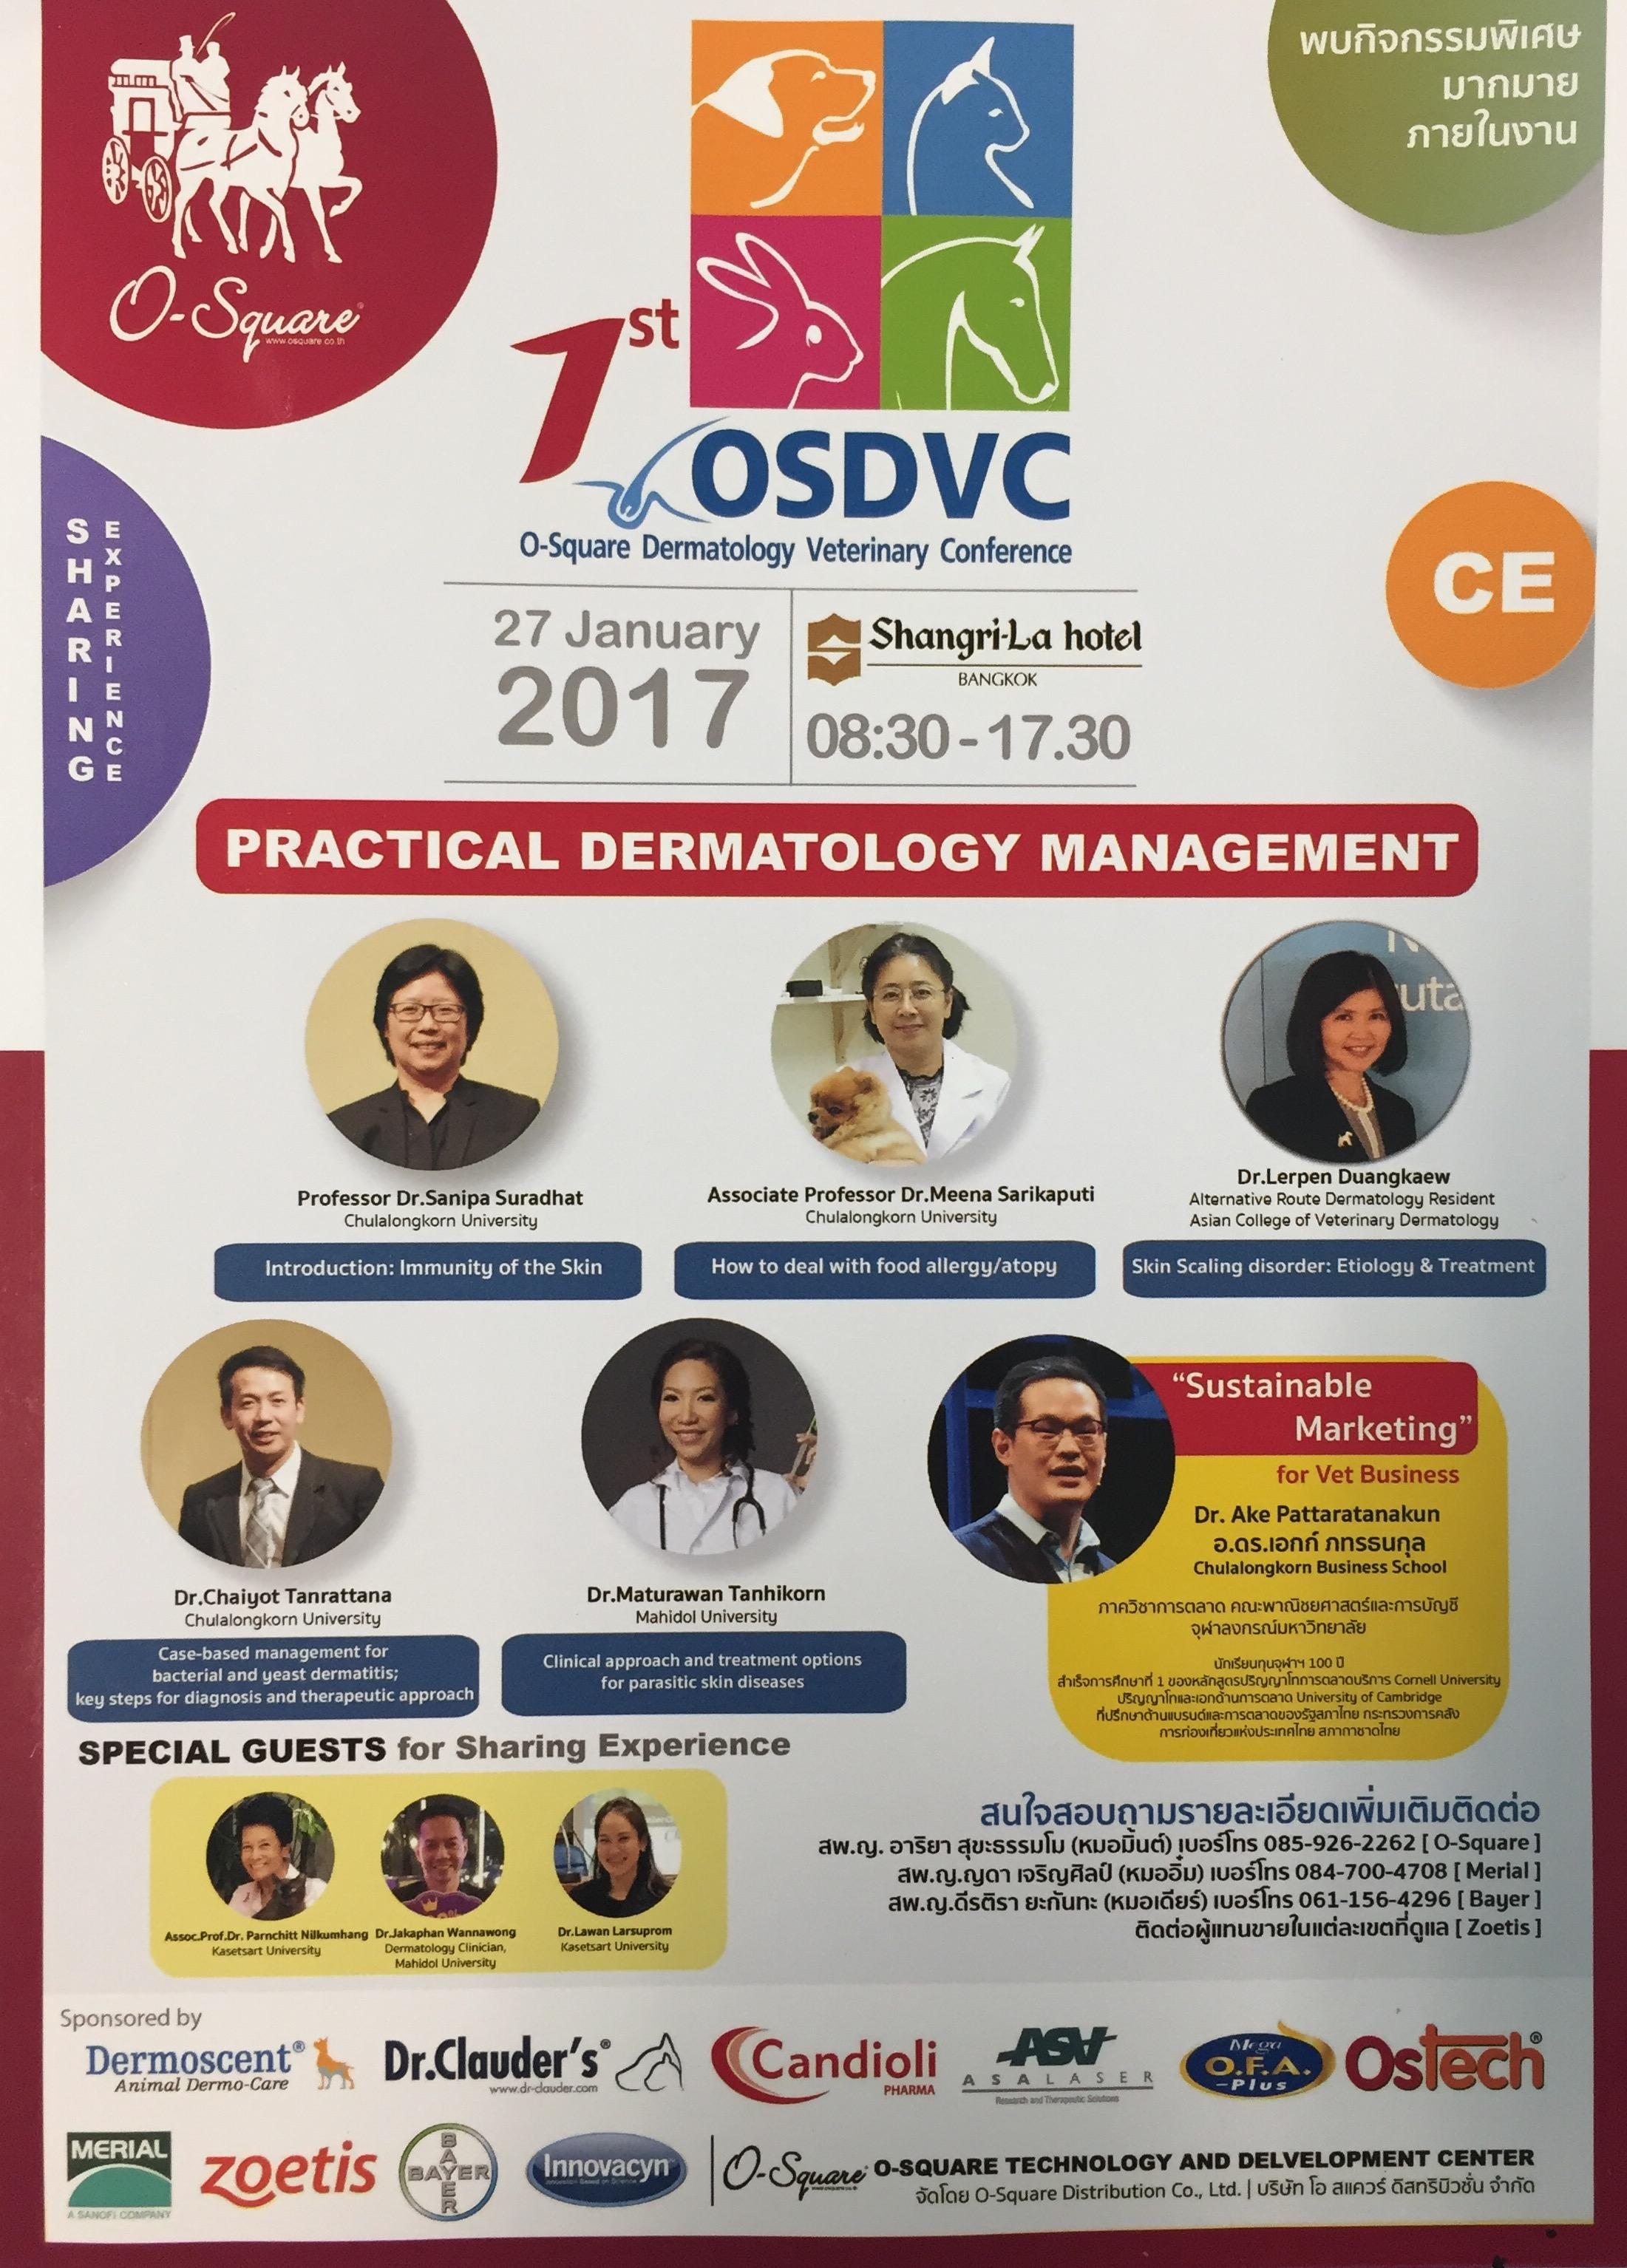 Bangkok: O-Square Dermatology Veterinary Conference